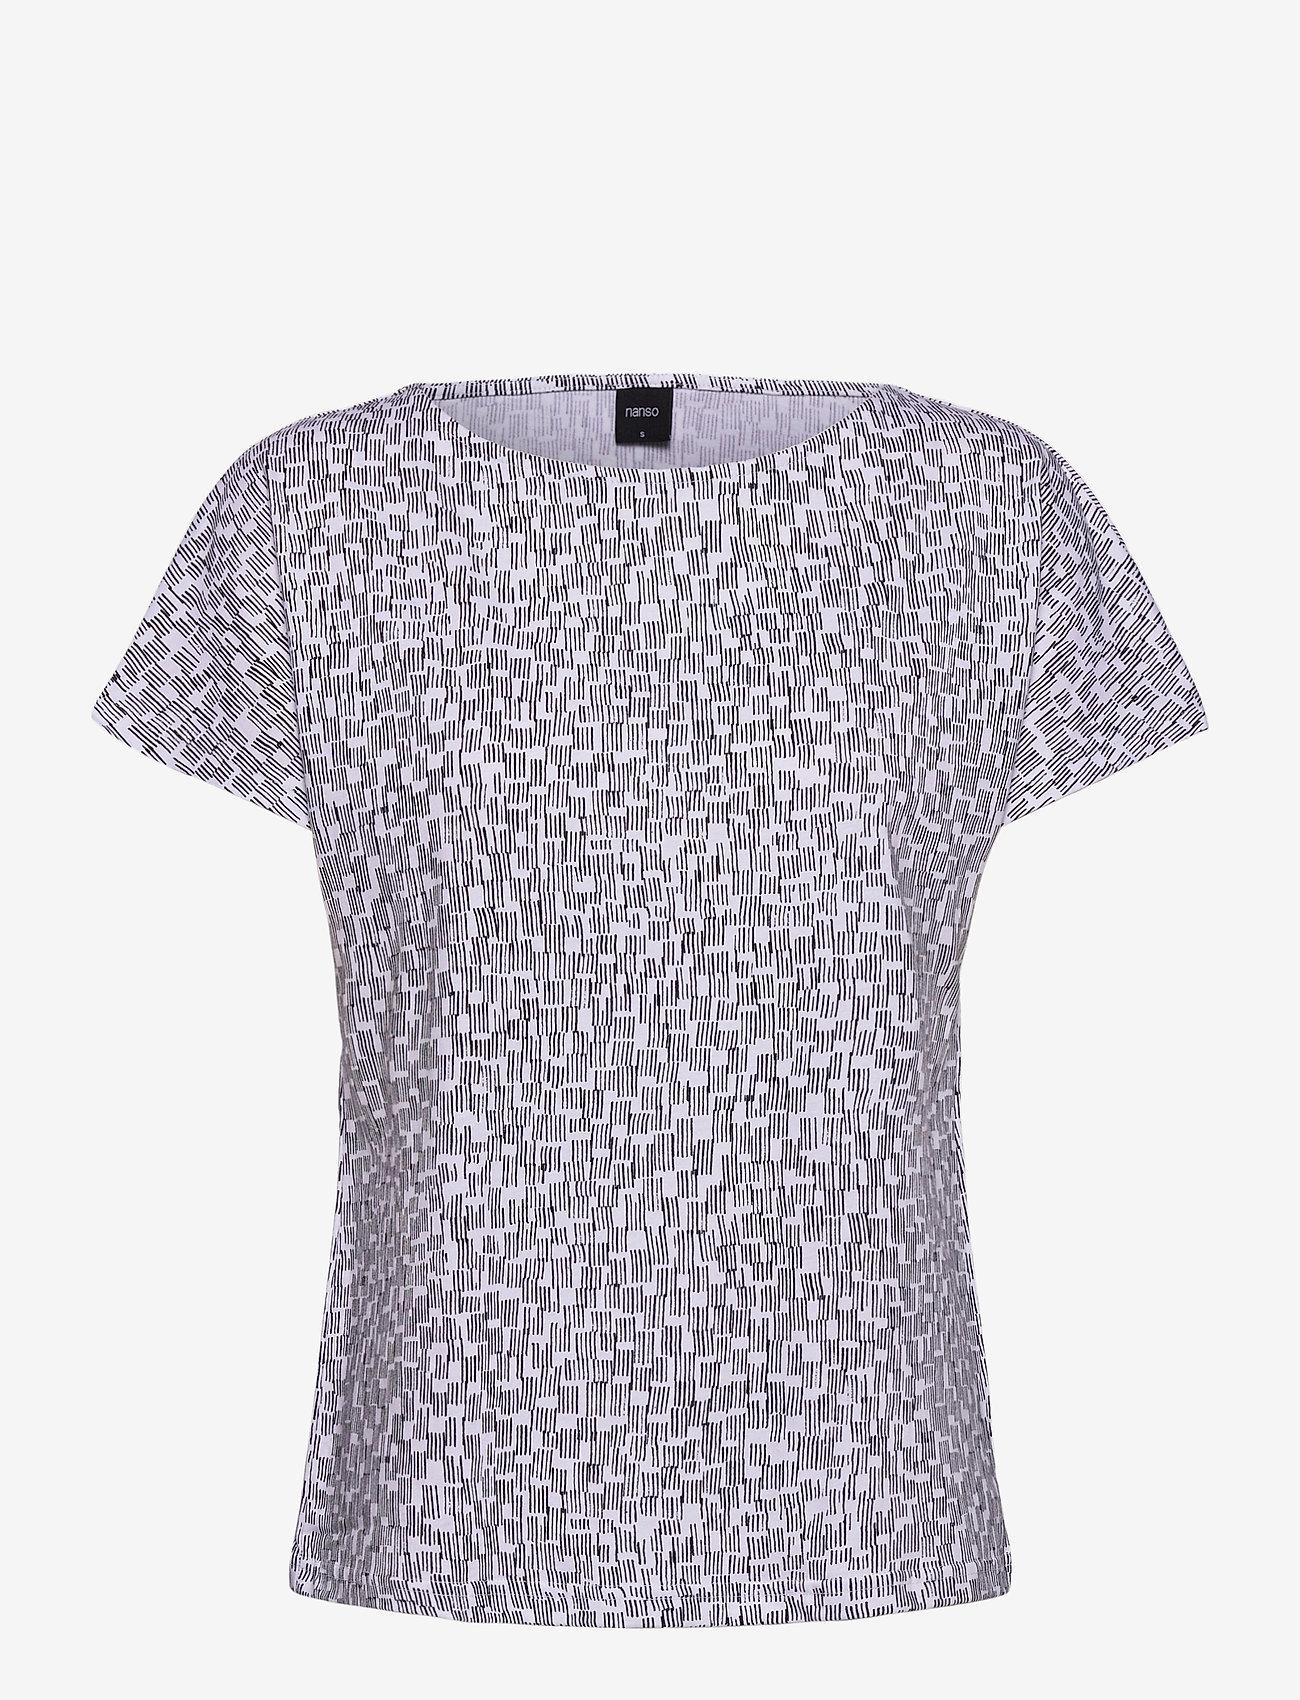 Nanso - Ladies blouse, Klippi - t-shirts - white - 0